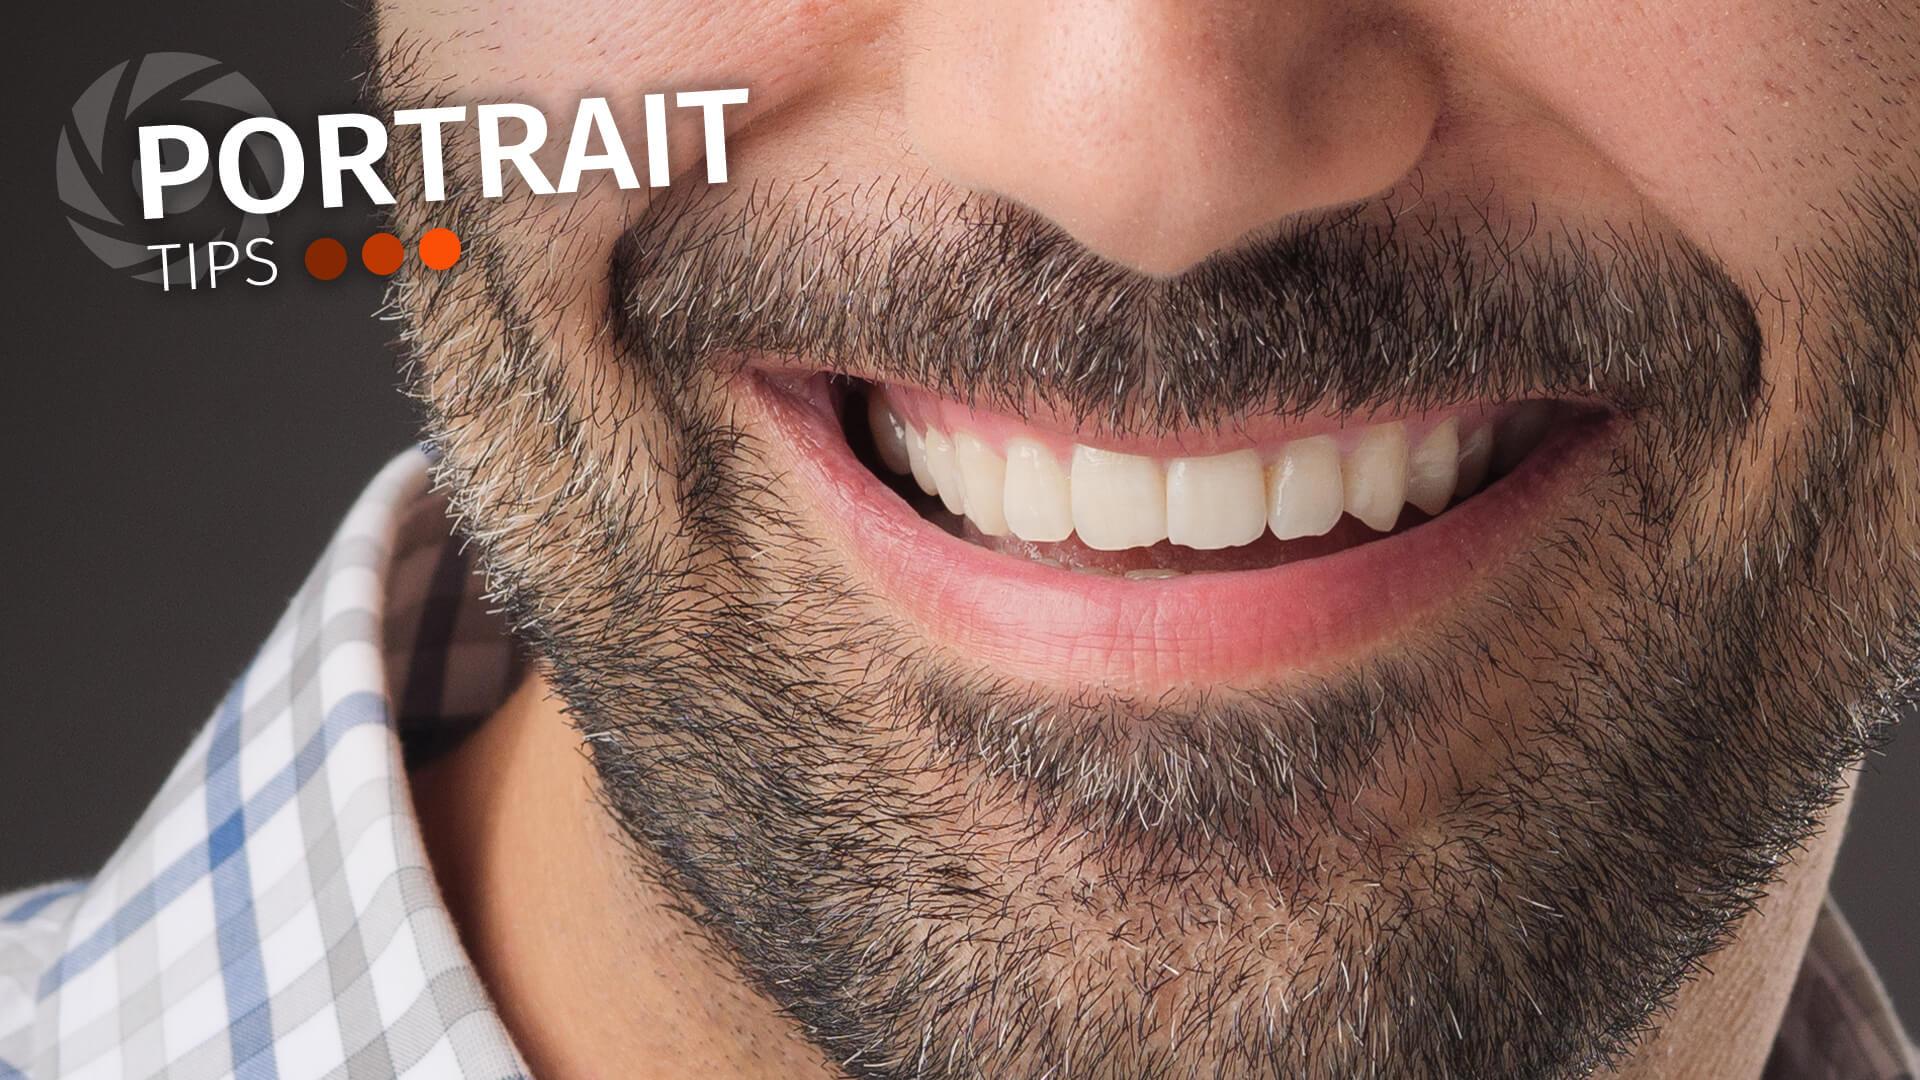 Portrait Tips: Teeth whitening in Lightroom (easy does it!)